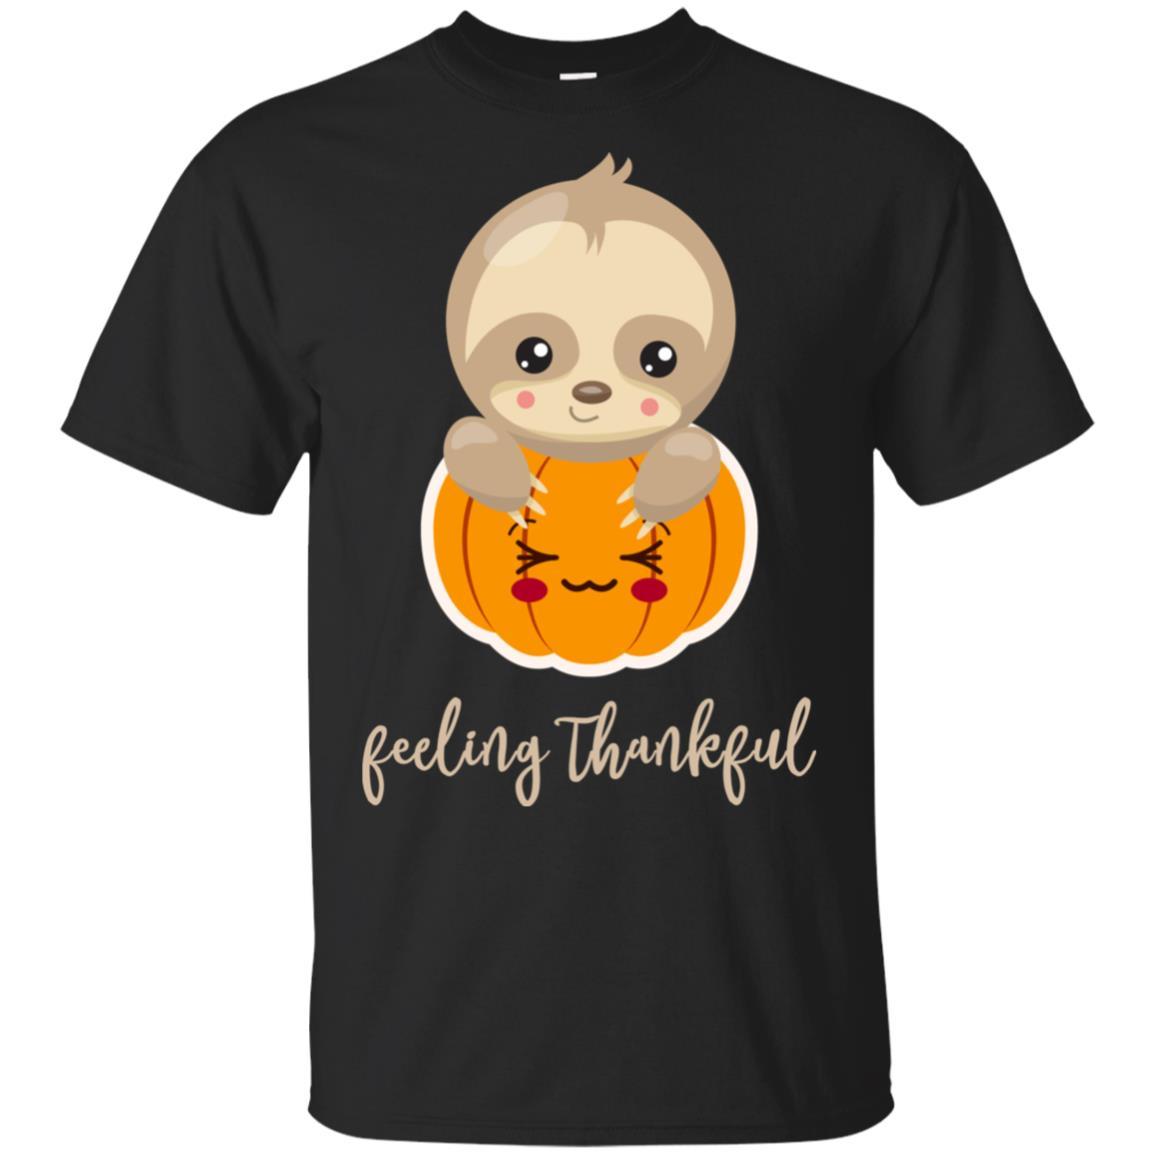 Sloth Feeling Thankful Cute Thanksgiving Gift Tee Unisex Short Sleeve